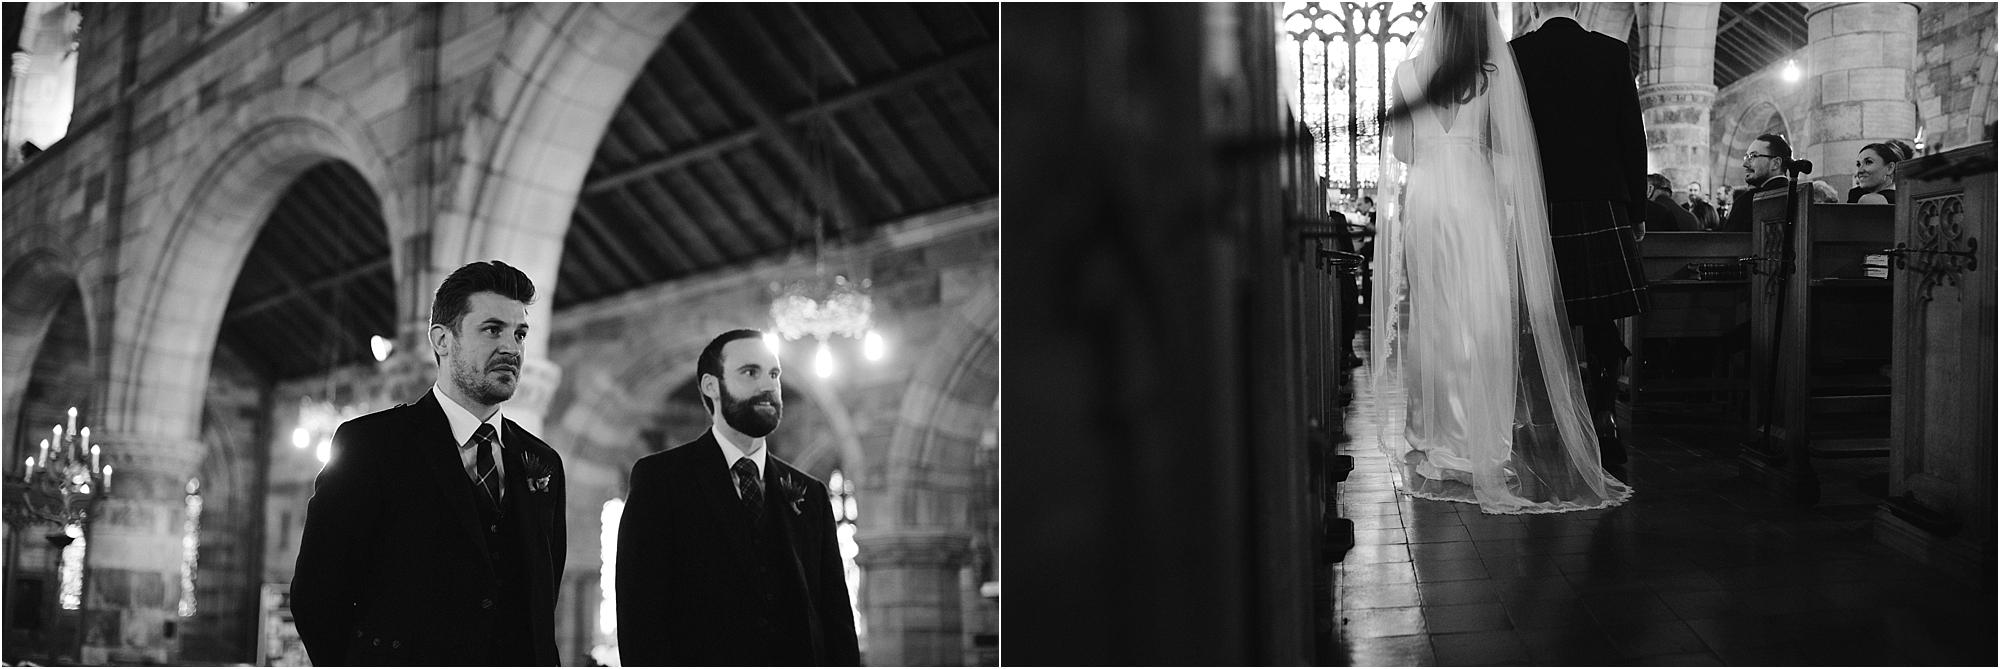 Scott+Joanna-Kinkell-Byre-wedding-fife-photography__0032.jpg